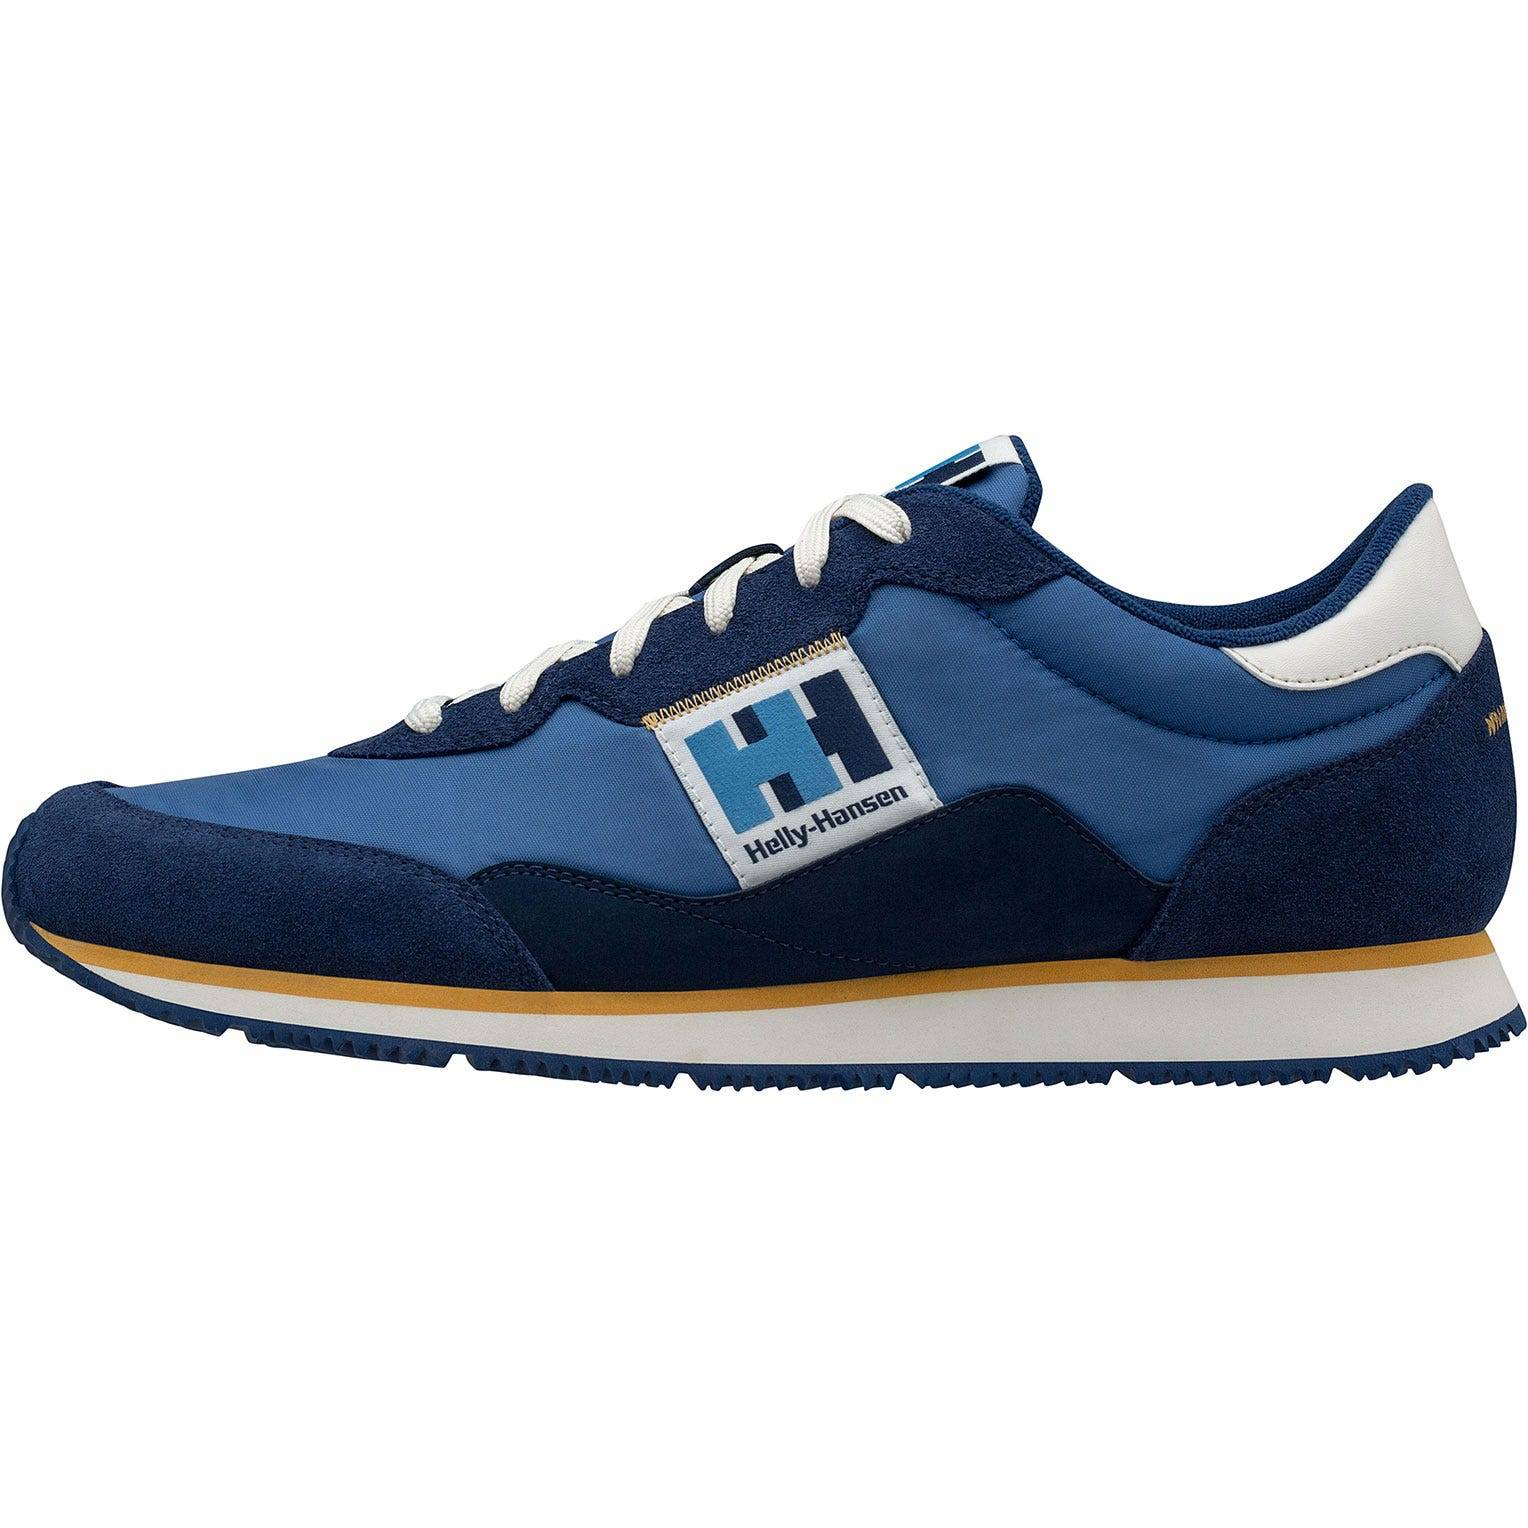 Helly Hansen Ripples Lowcut Sneaker Mens Blue 40/7